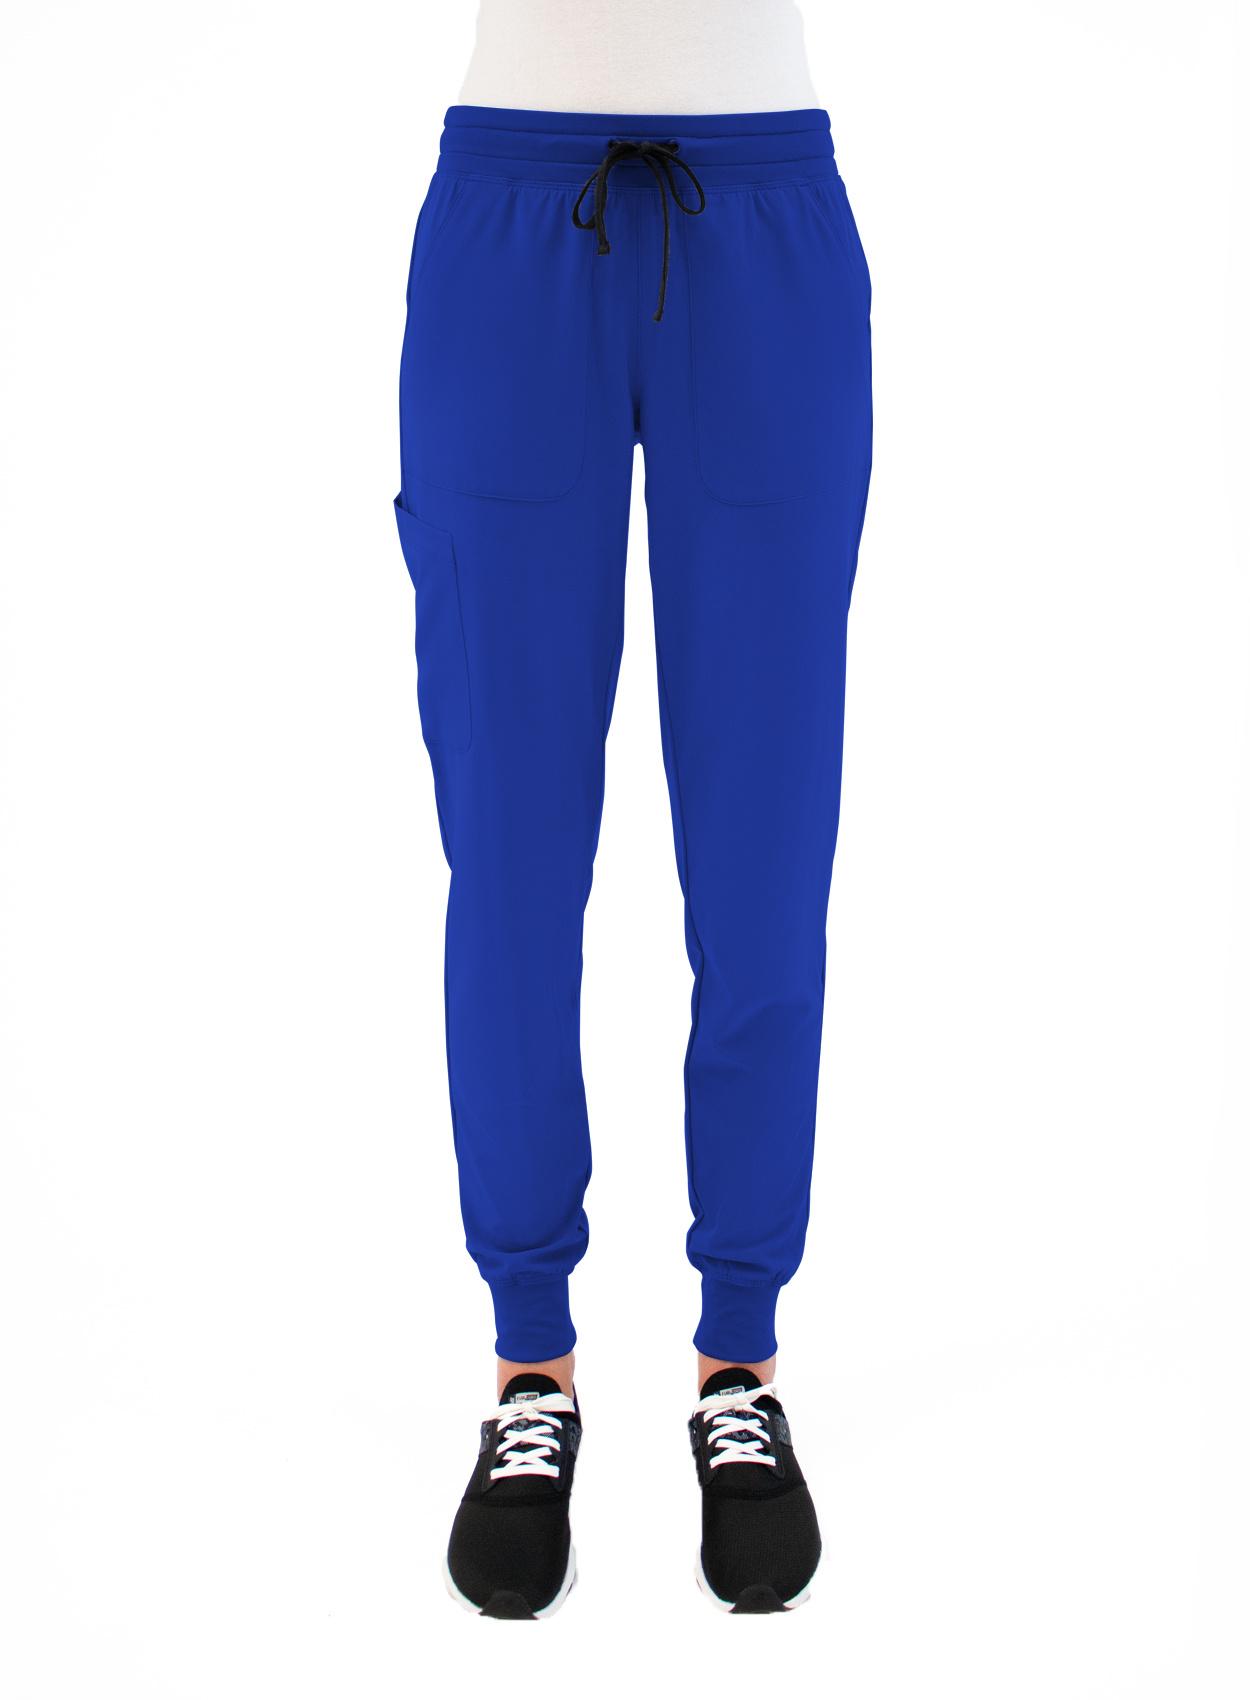 MATRIX IMPULSE Royal Blue Yoga Waistband Women's Jogger Pants 8520